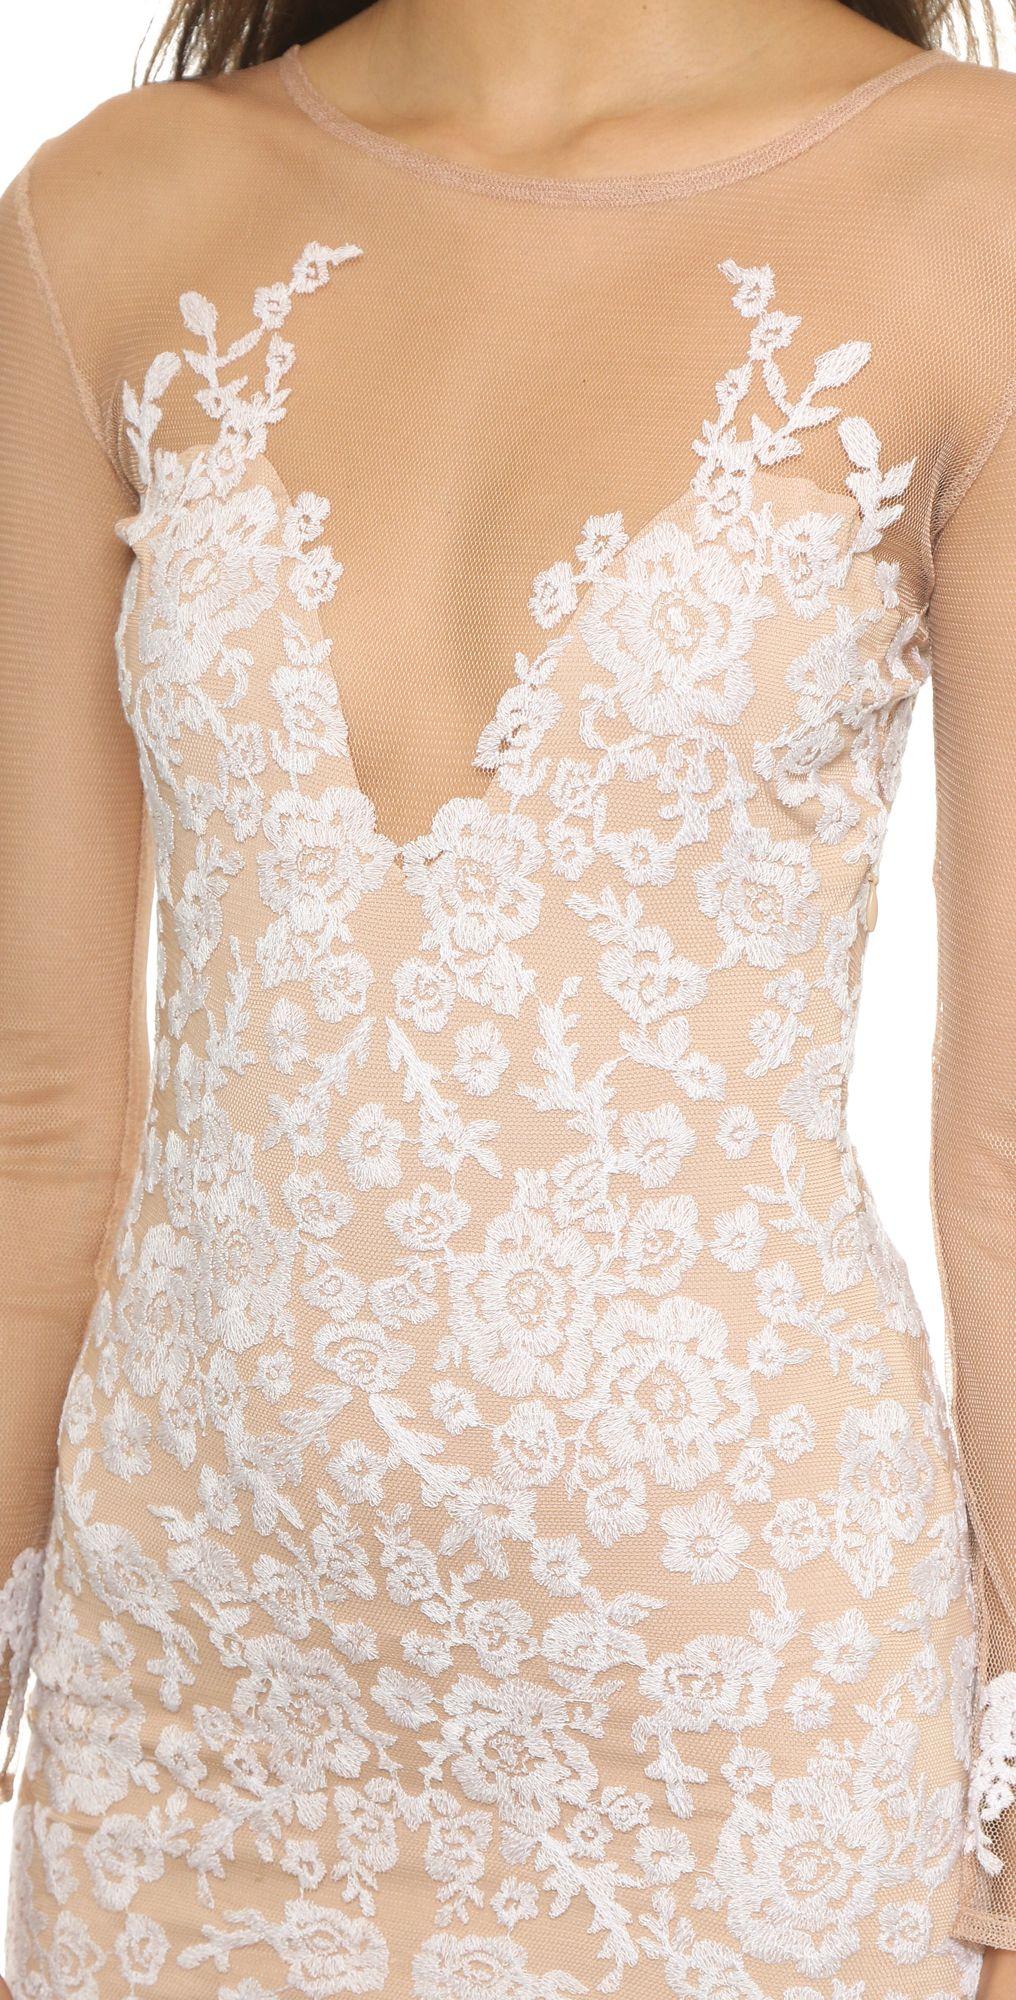 For Love & Lemons Luau Mini Dress | SHOPBOP